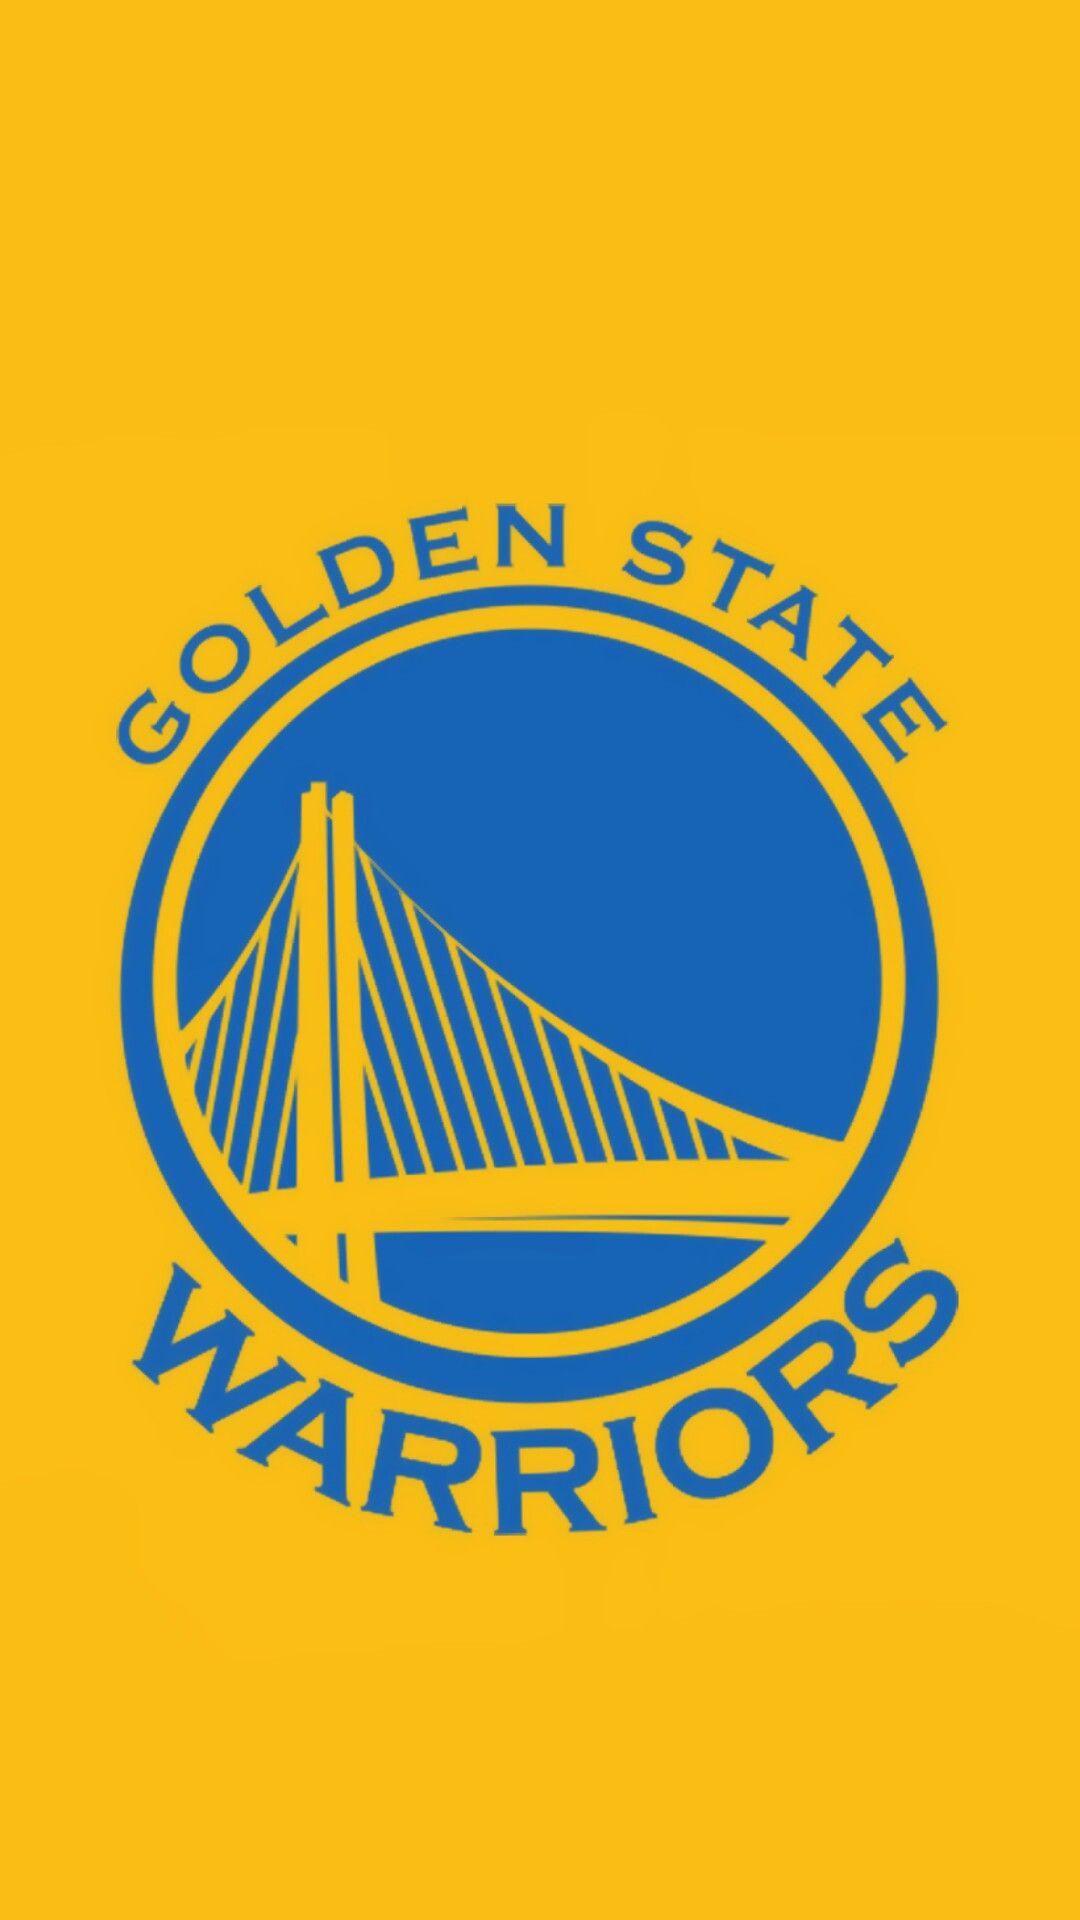 Wallpaper Logo Classic Golden State Warriors Fun Art Follow Me Cầu Thủ Nba Nba